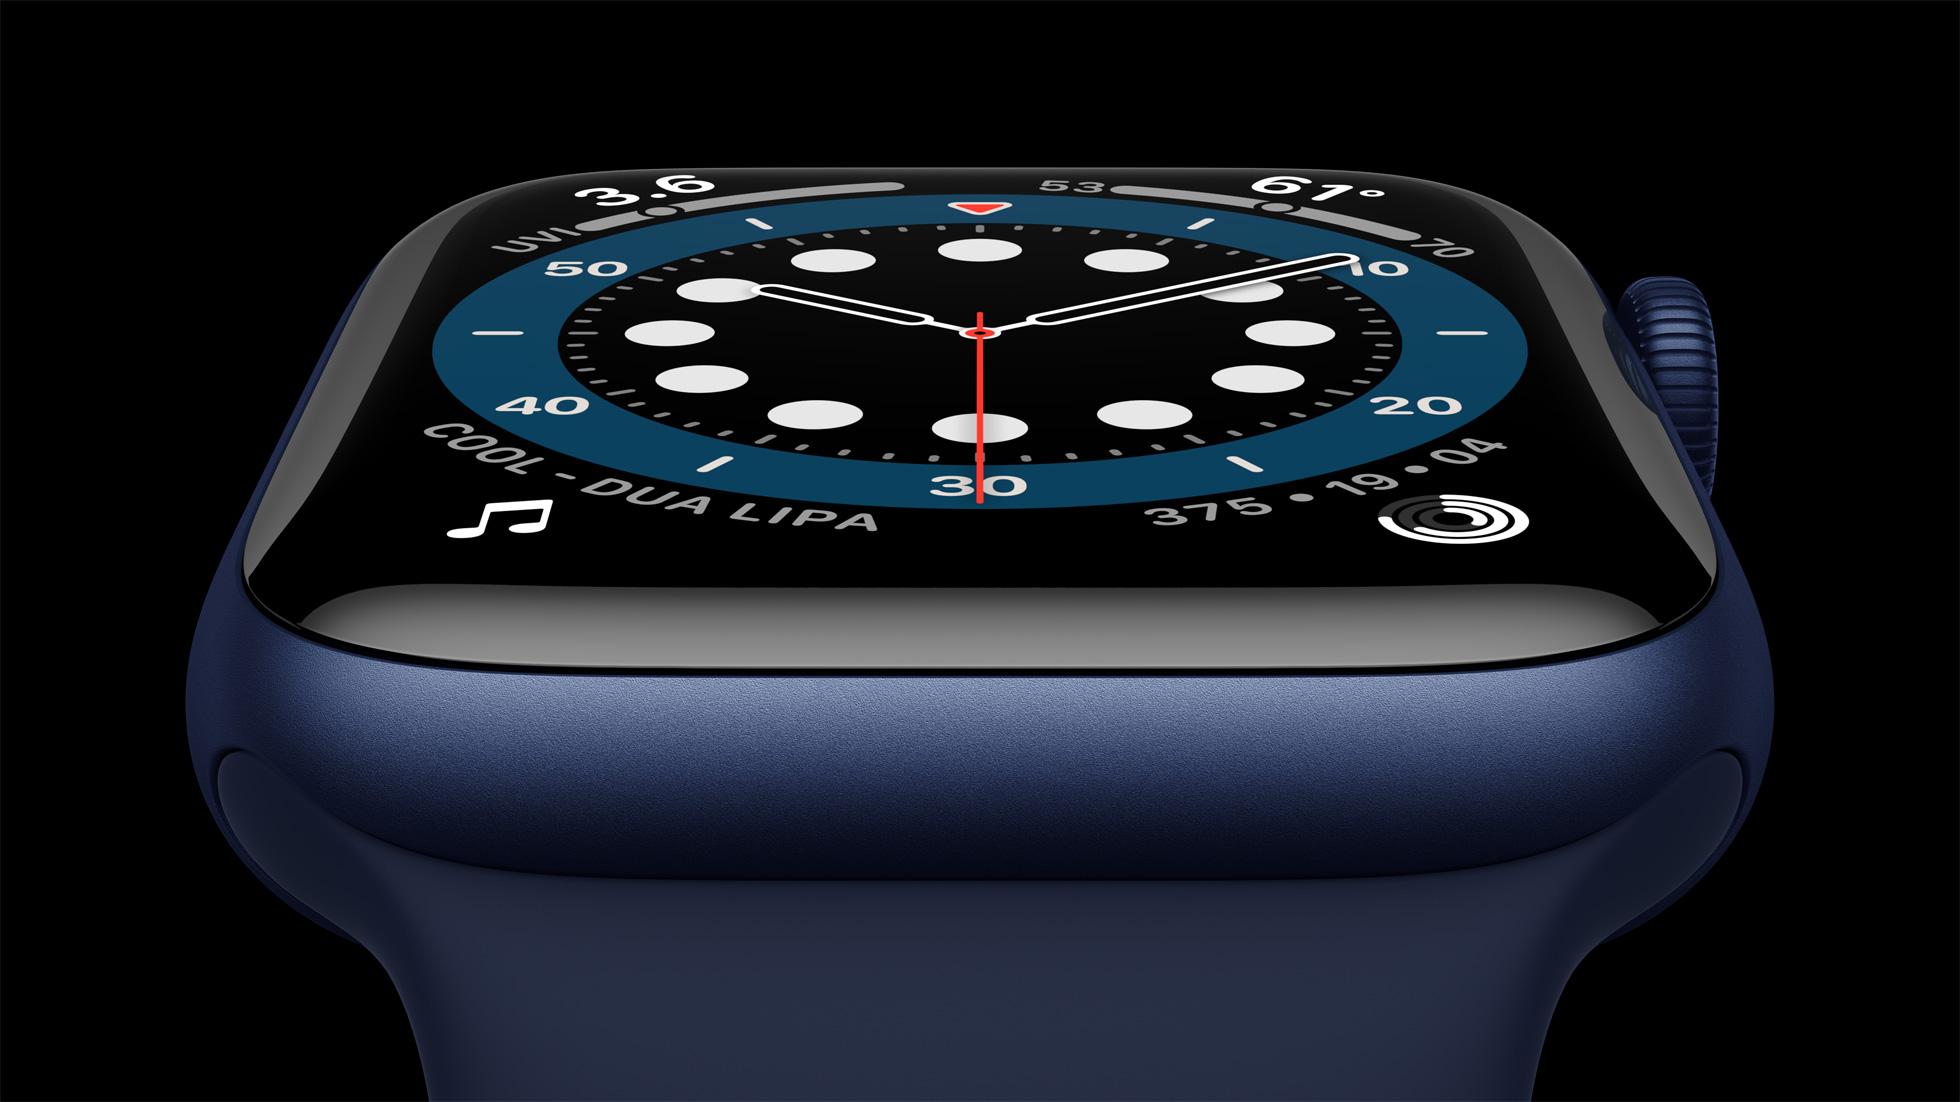 Apple watch series 6 Aluminum blue case close up 09152020